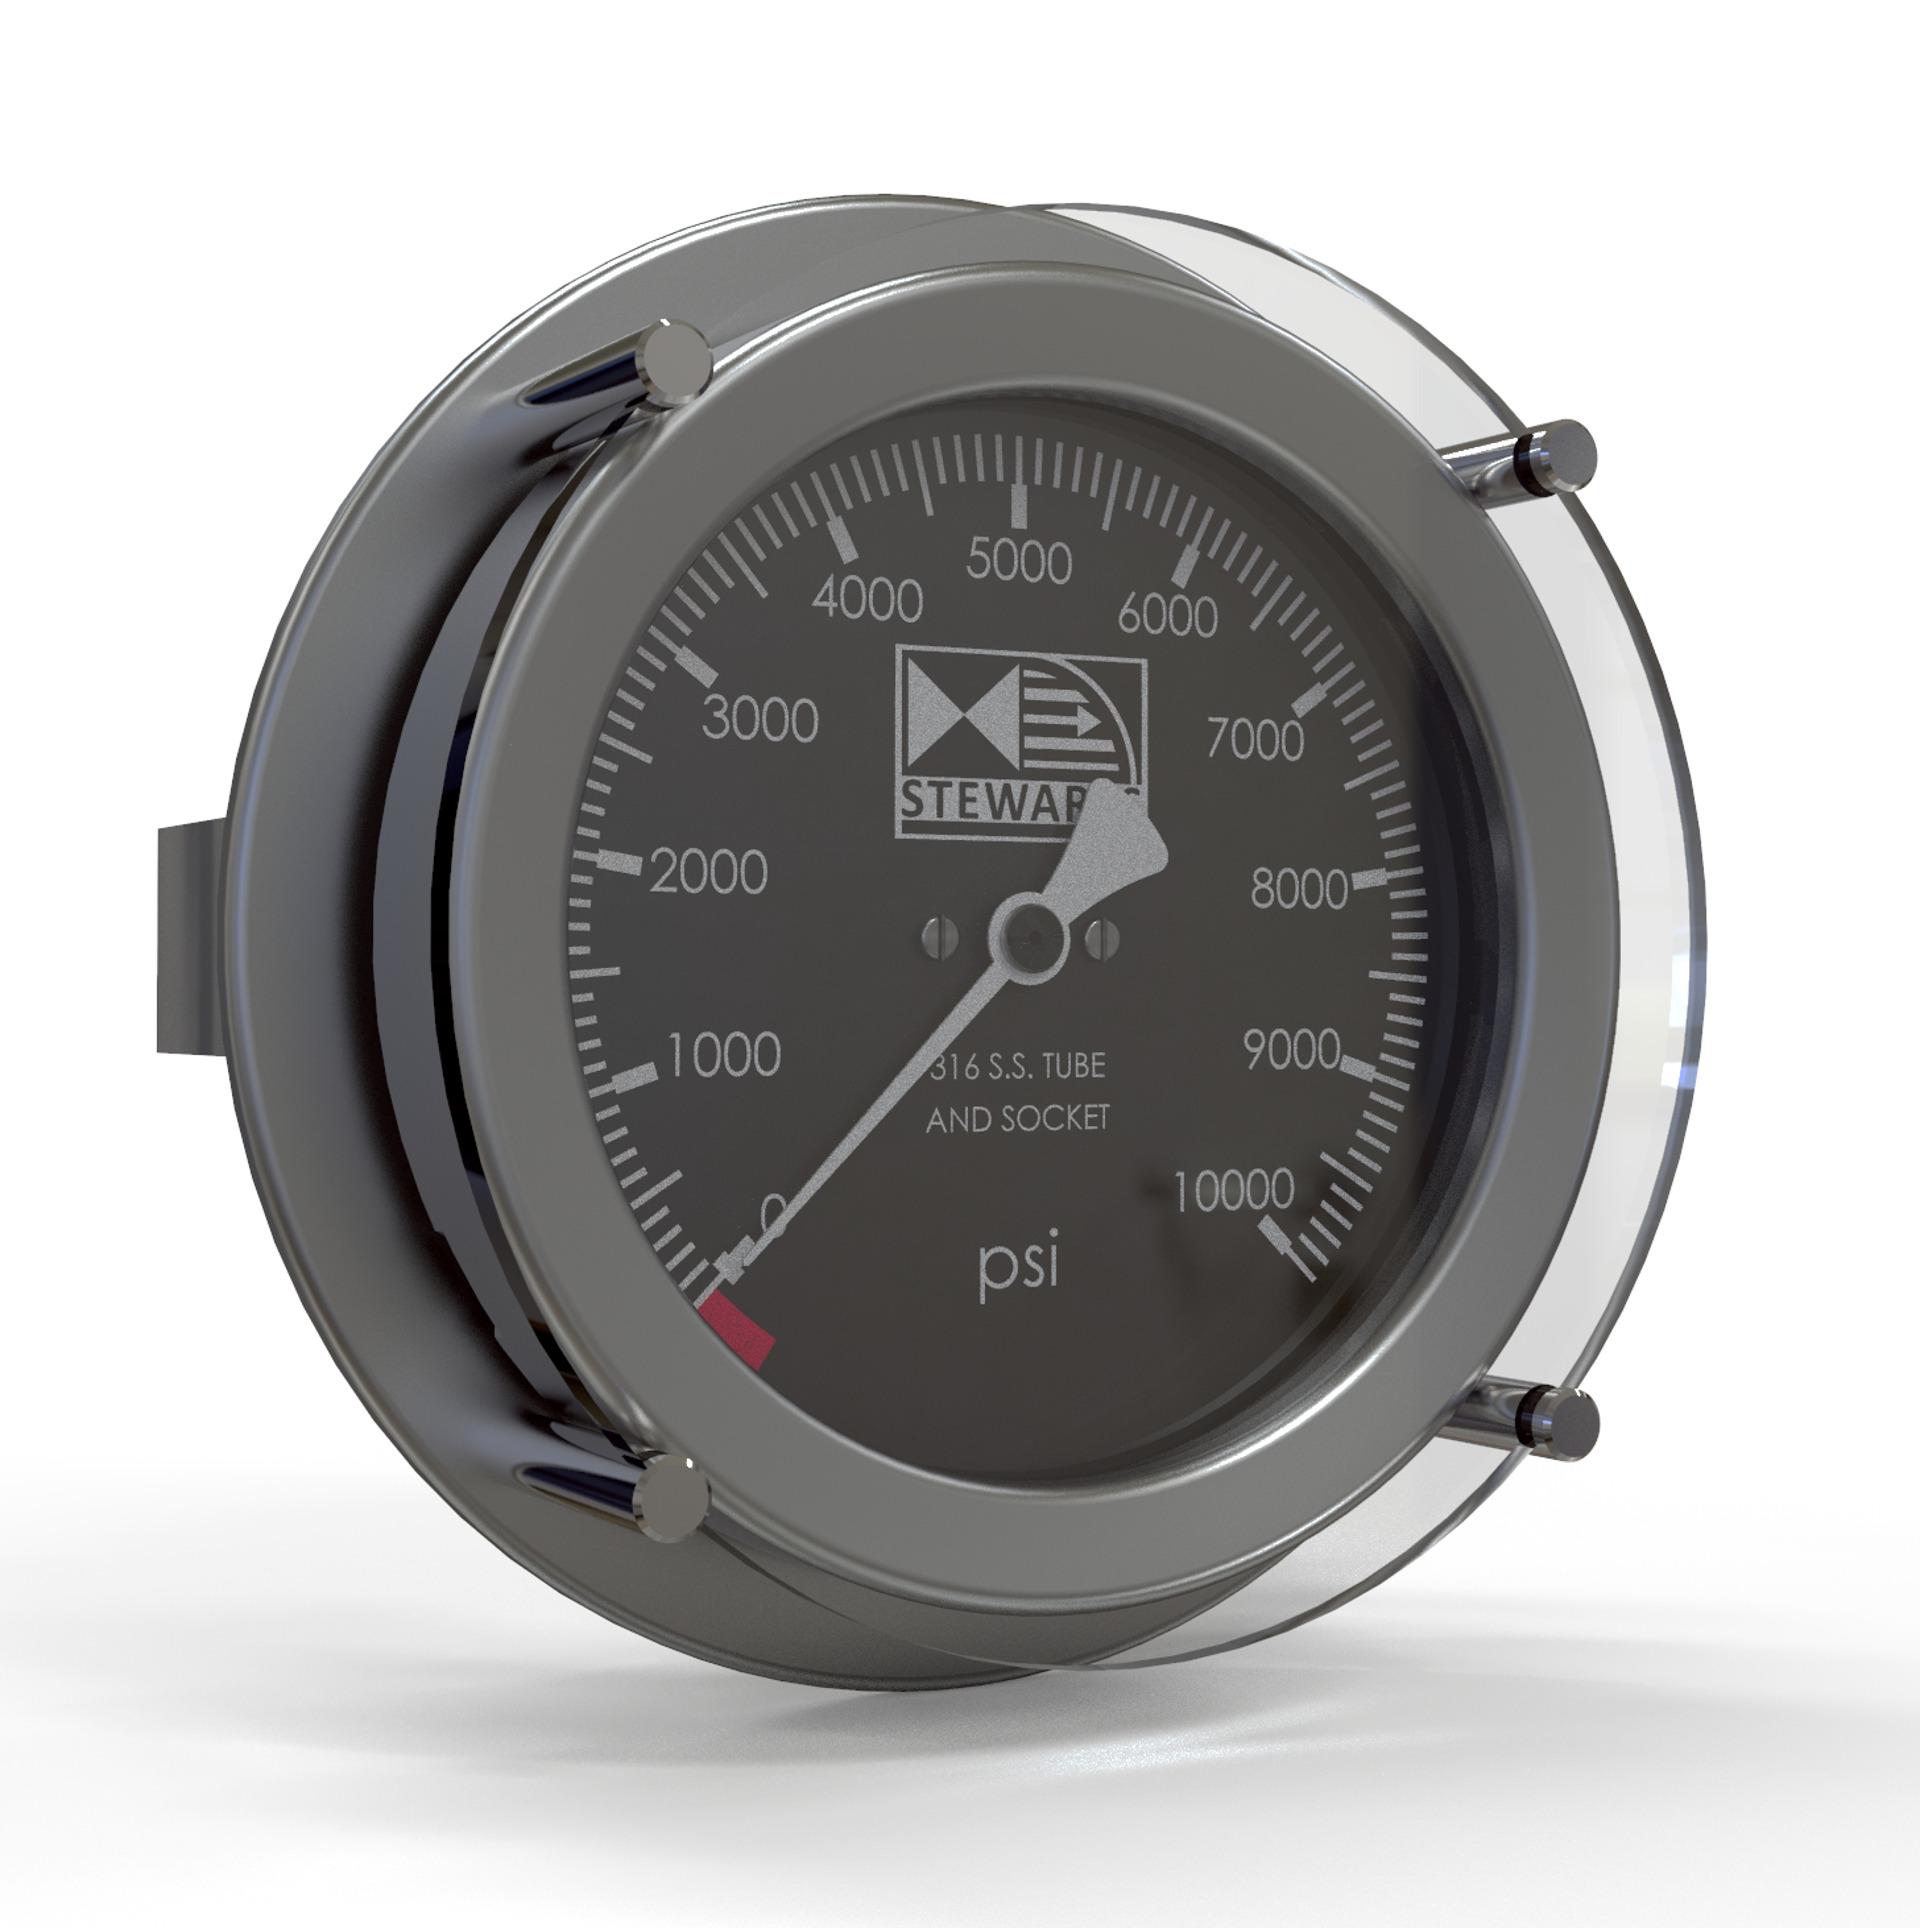 Subsea pressure gauge manometer ROV2 model 8024 AG